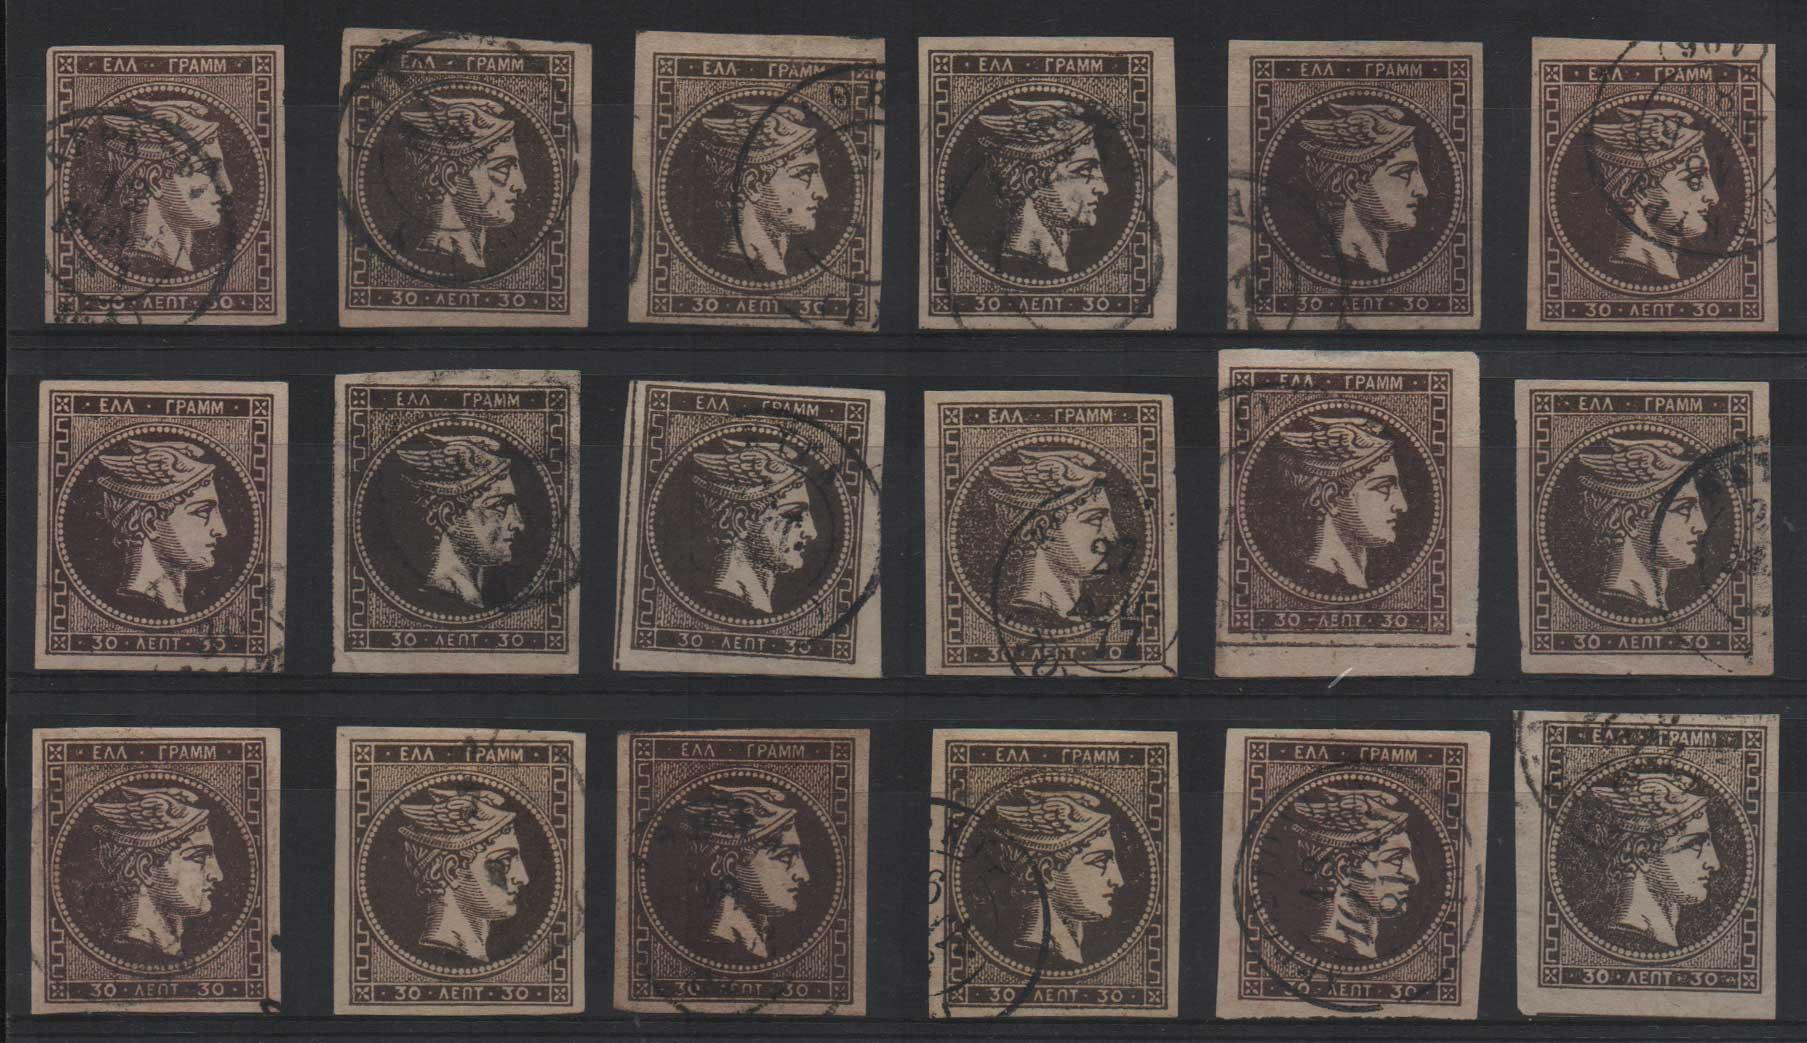 Lot 15 - -  LARGE HERMES HEAD large hermes head -  Athens Auctions Public Auction 70 General Stamp Sale